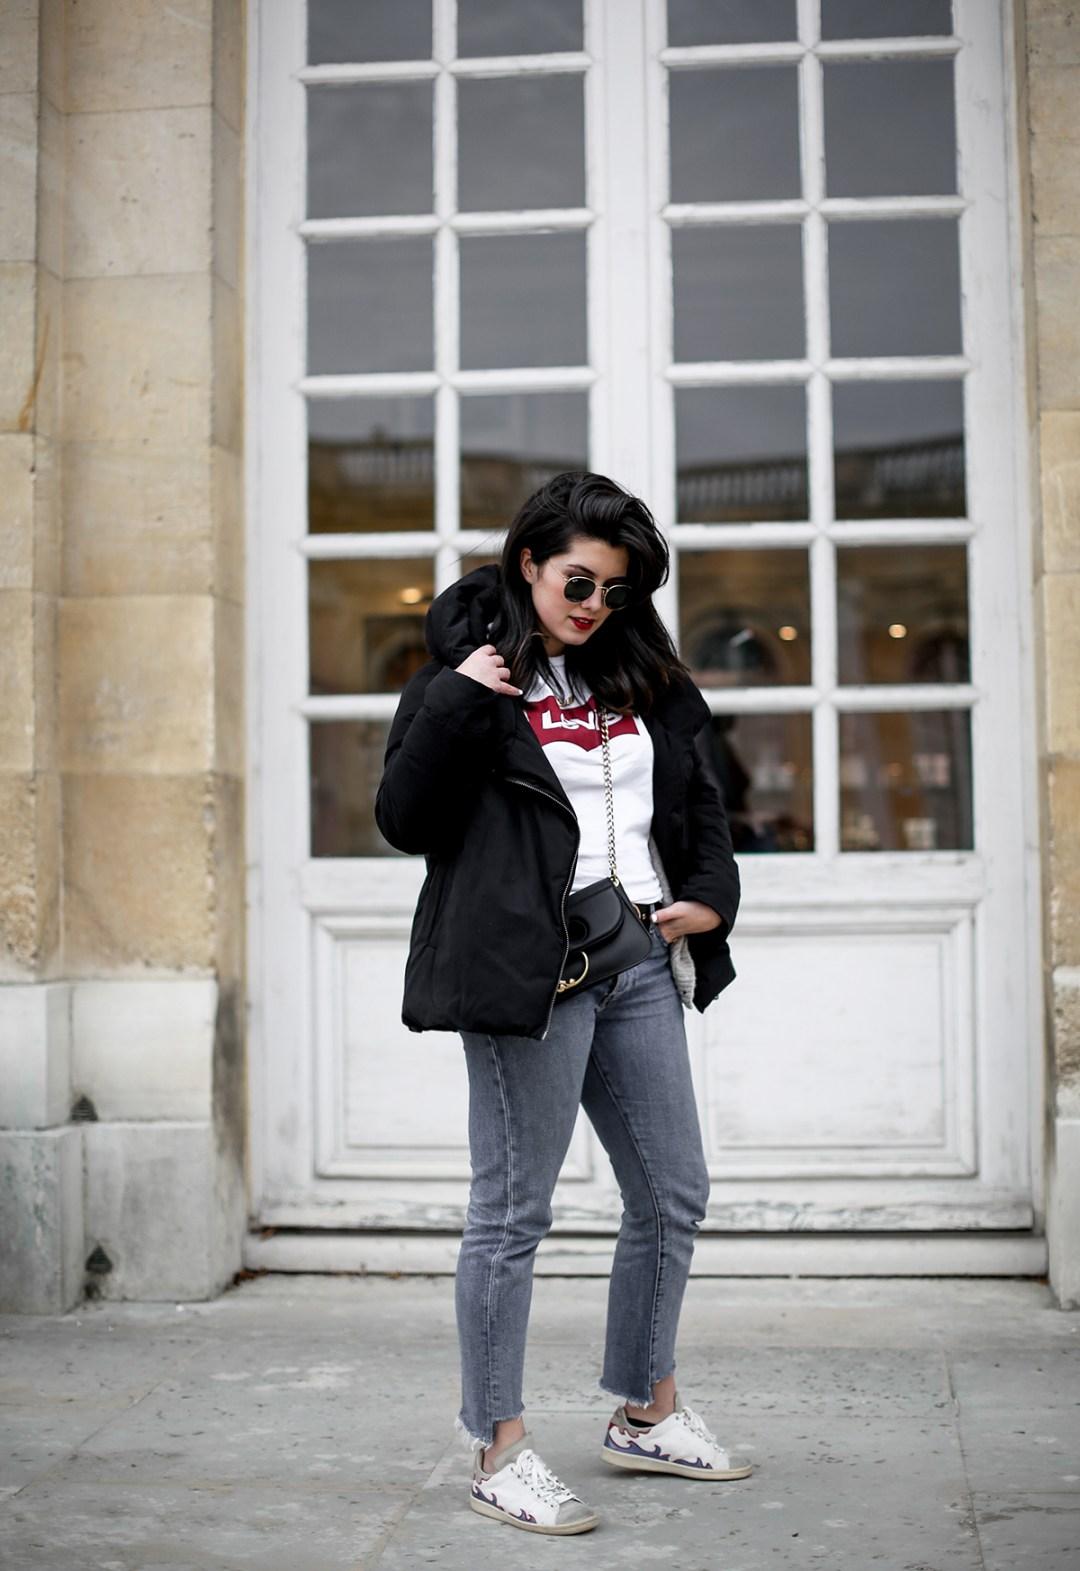 puffer-coat-levis-shirt-basic-505c-jeans-jw-anderson-pierce-bag-how-to-wear10